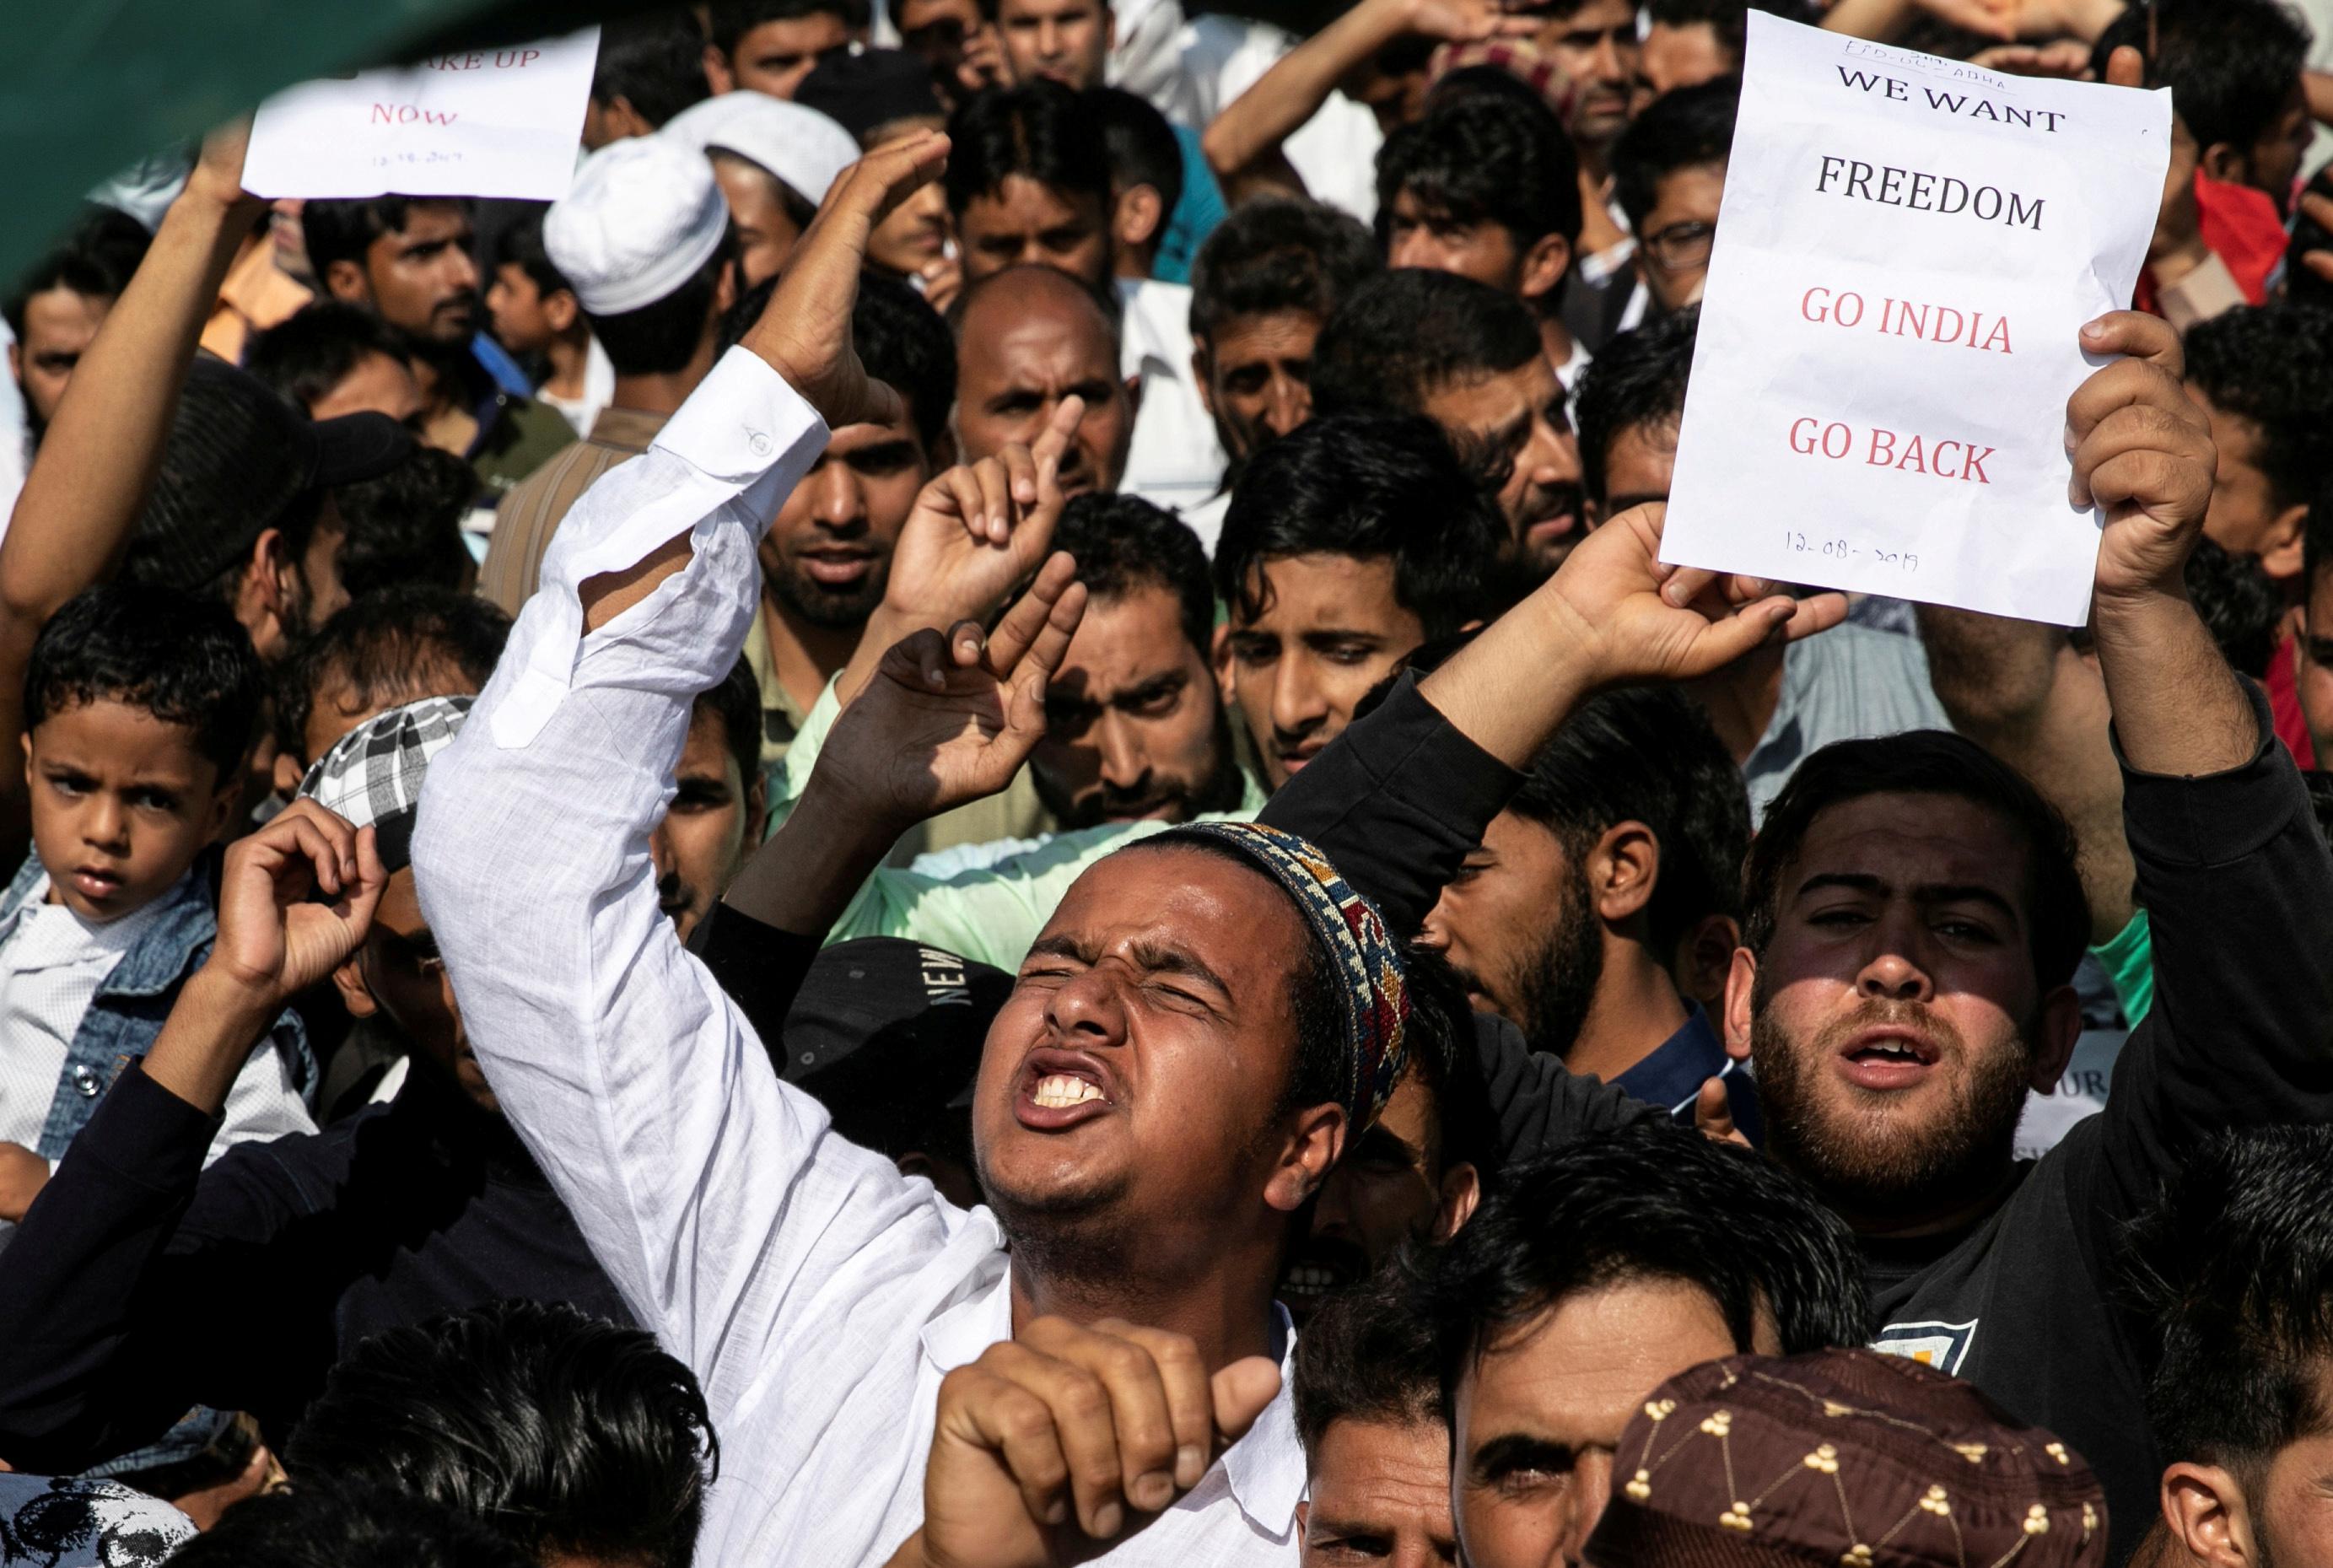 Besieged Kashmiri neighborhood in test of wills with India's Modi